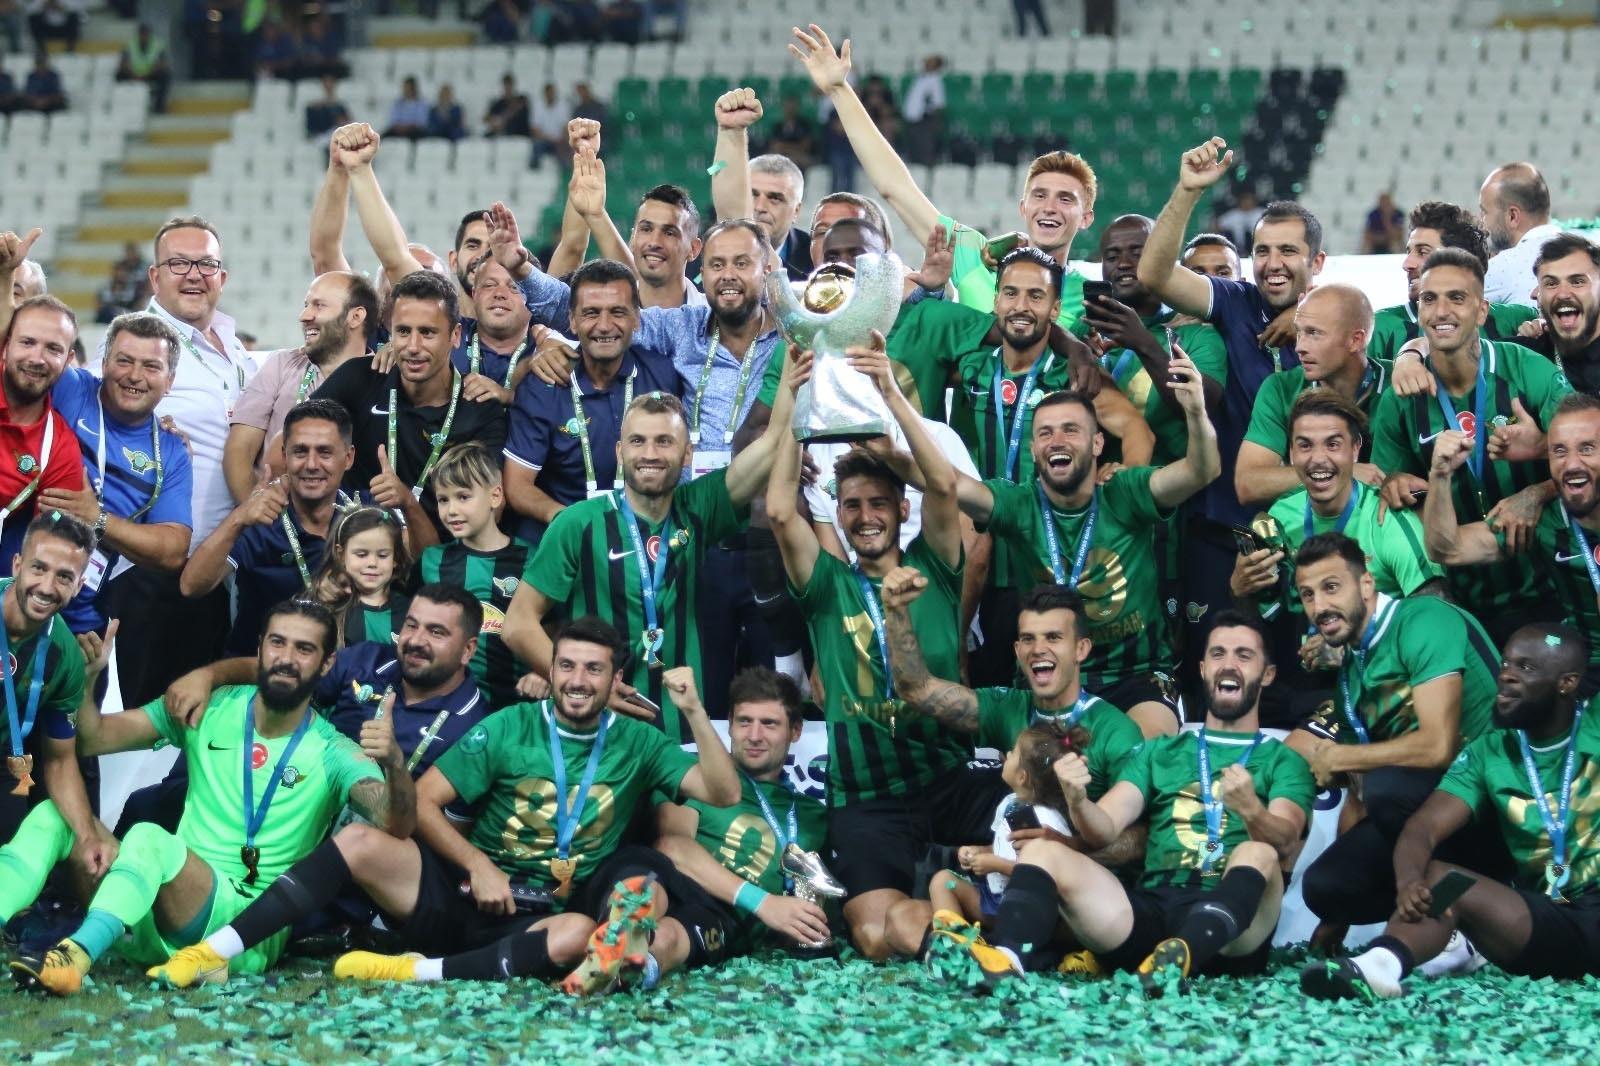 Akhisarspor players celebrate winning the Turkish Super Cup after  beating  Galatasaray 5-4 in penalties at New Konya Stadium on Sunday.